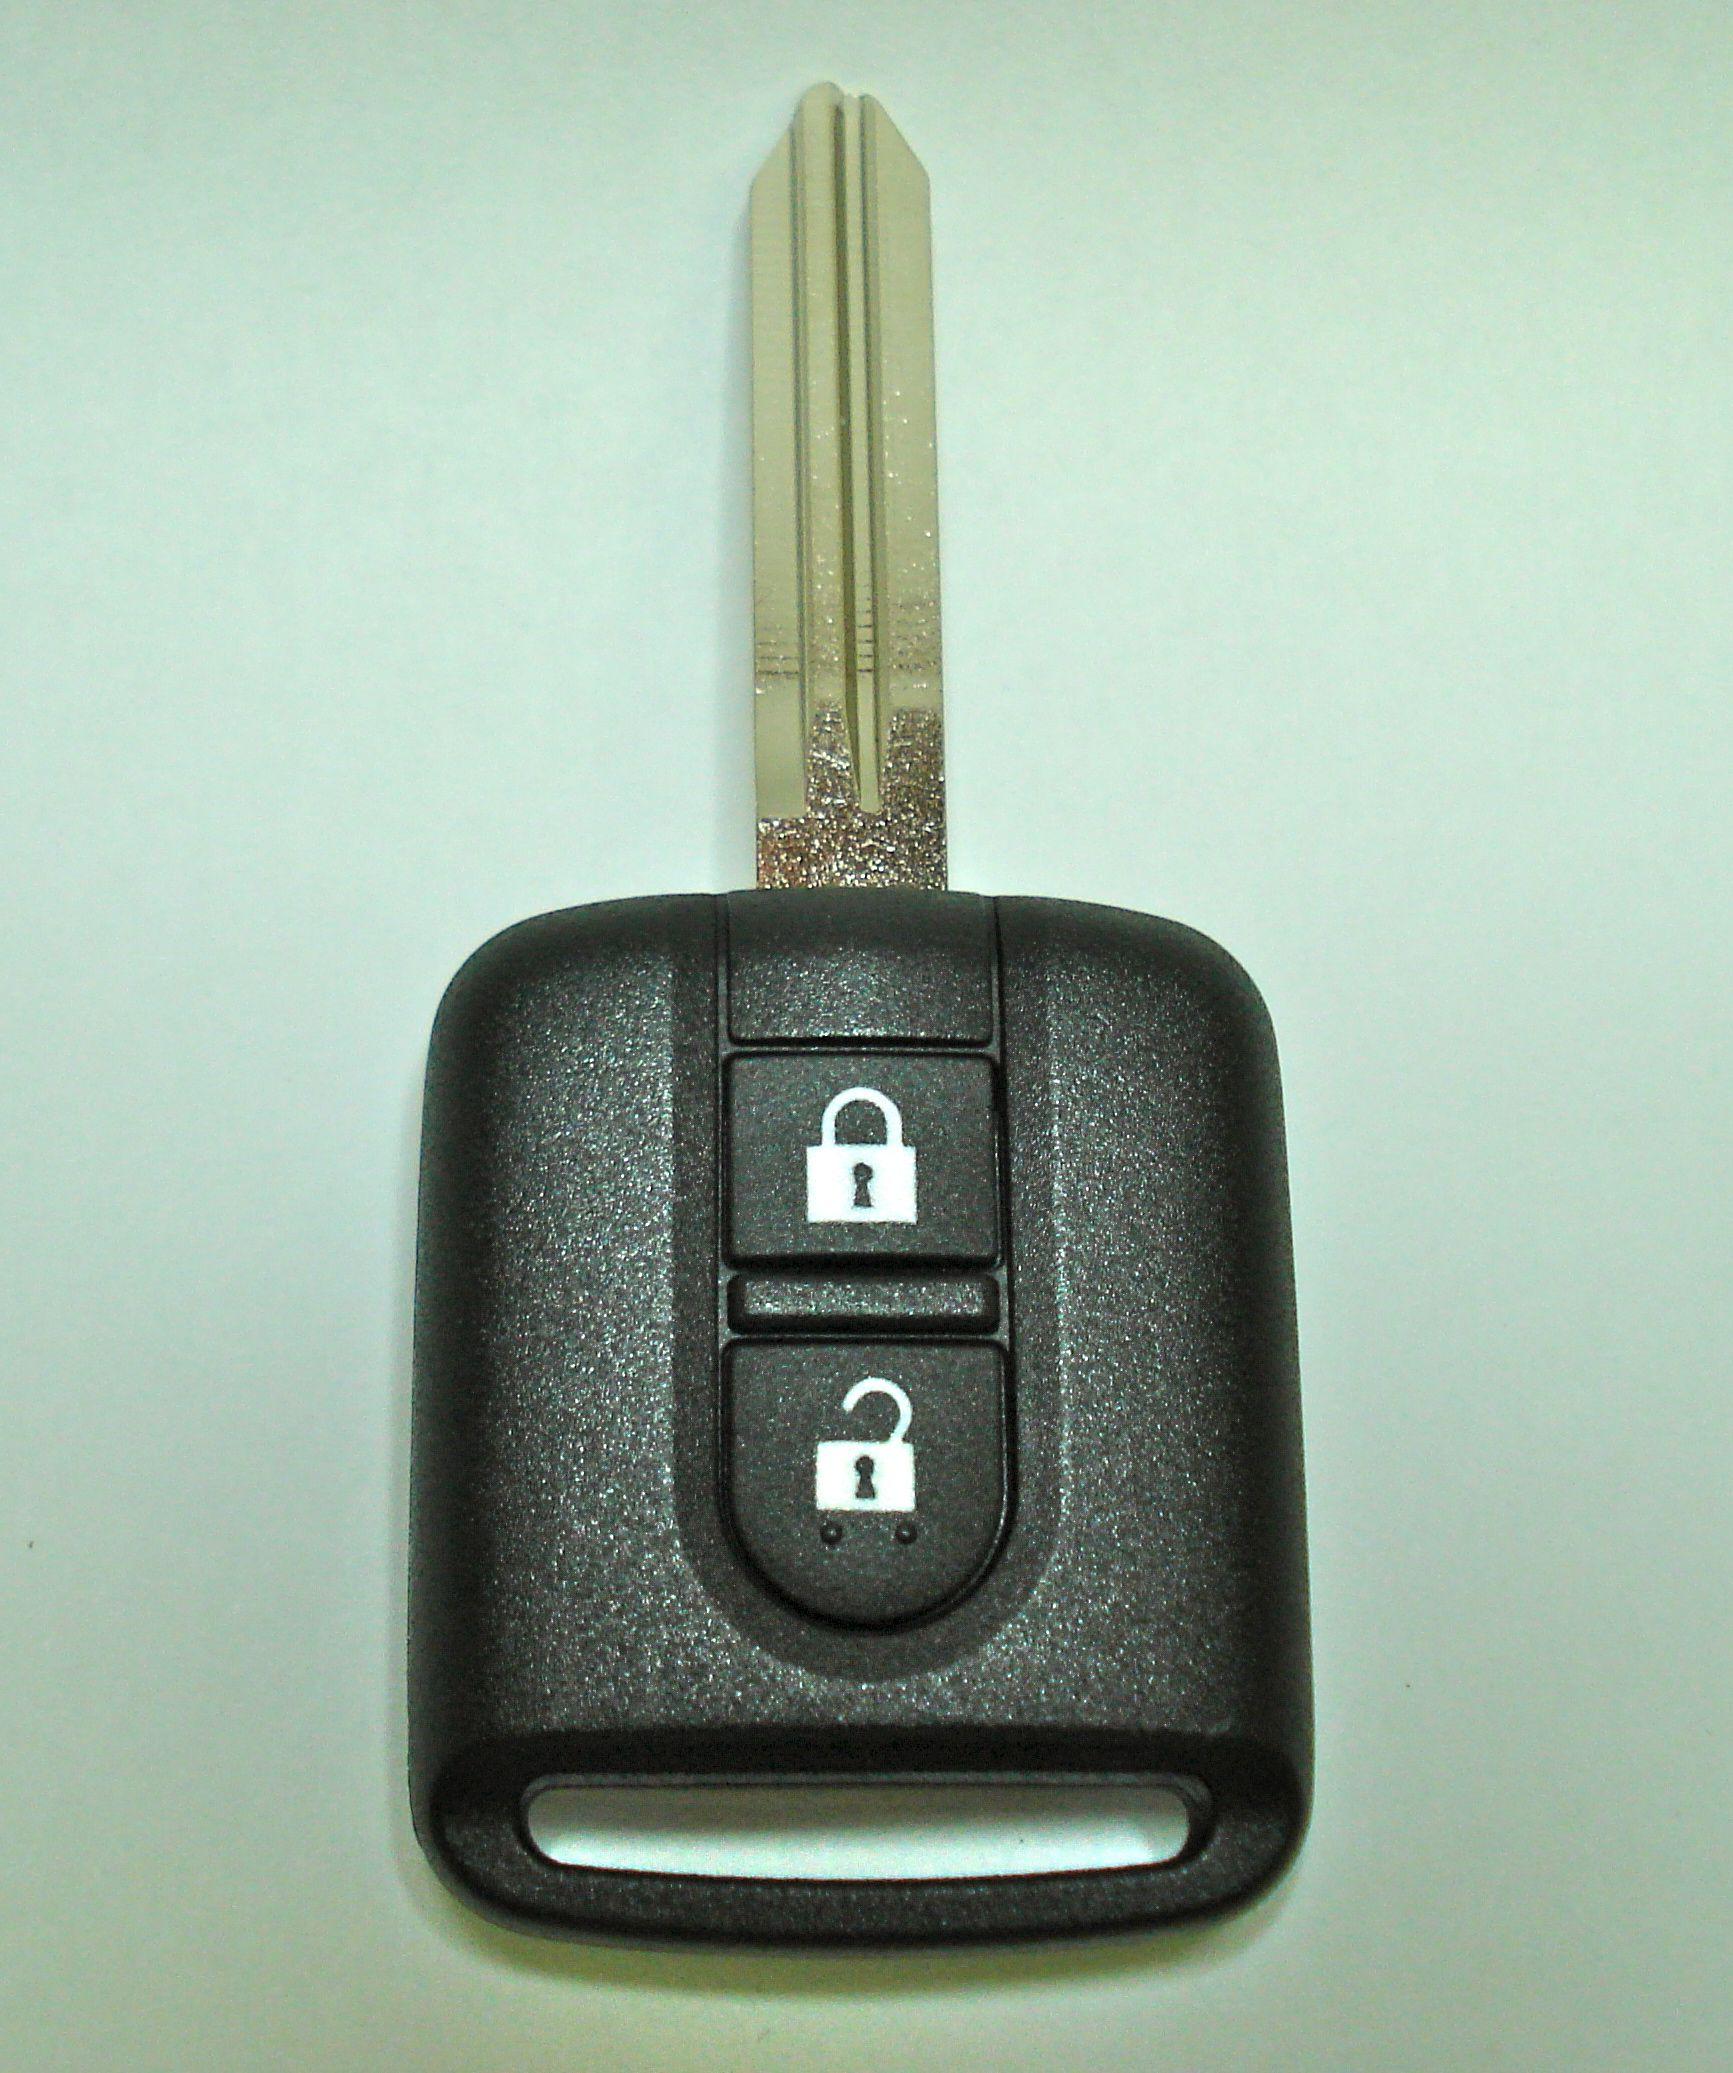 Nissan remote key ID46 £129+Vat for Nissan Micra, Navara